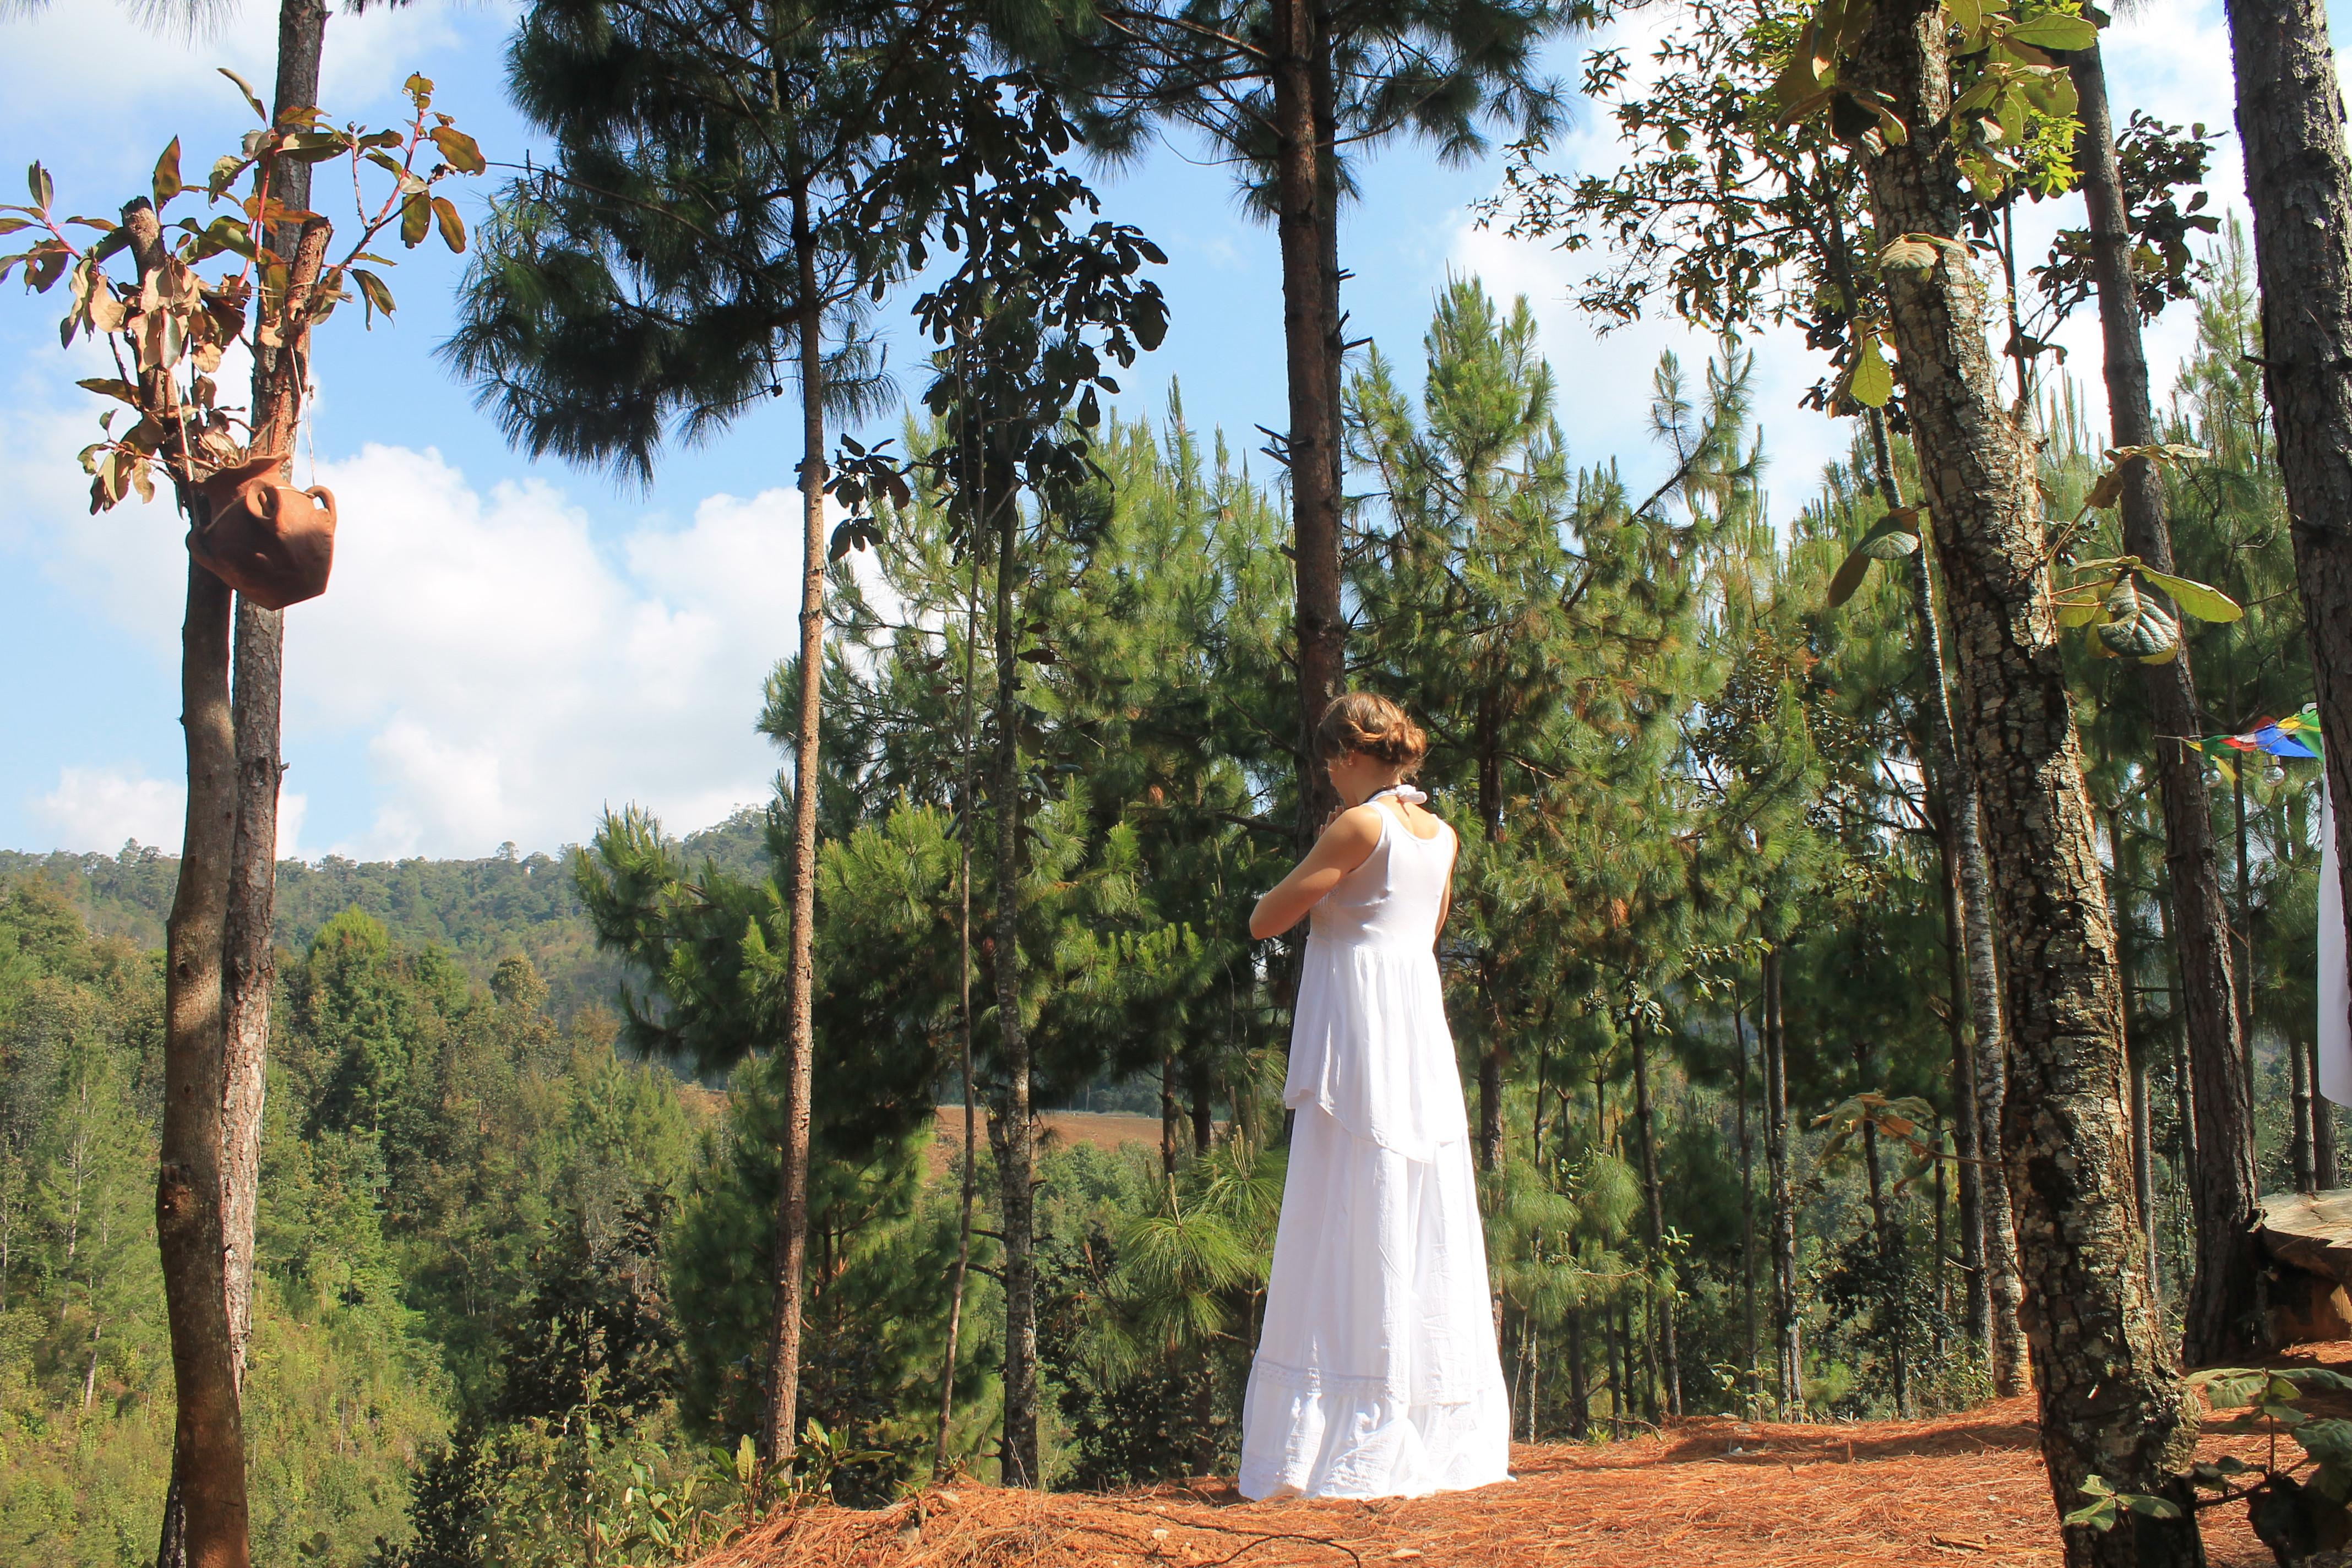 10 Day Hridaya Silent Meditation Retreat